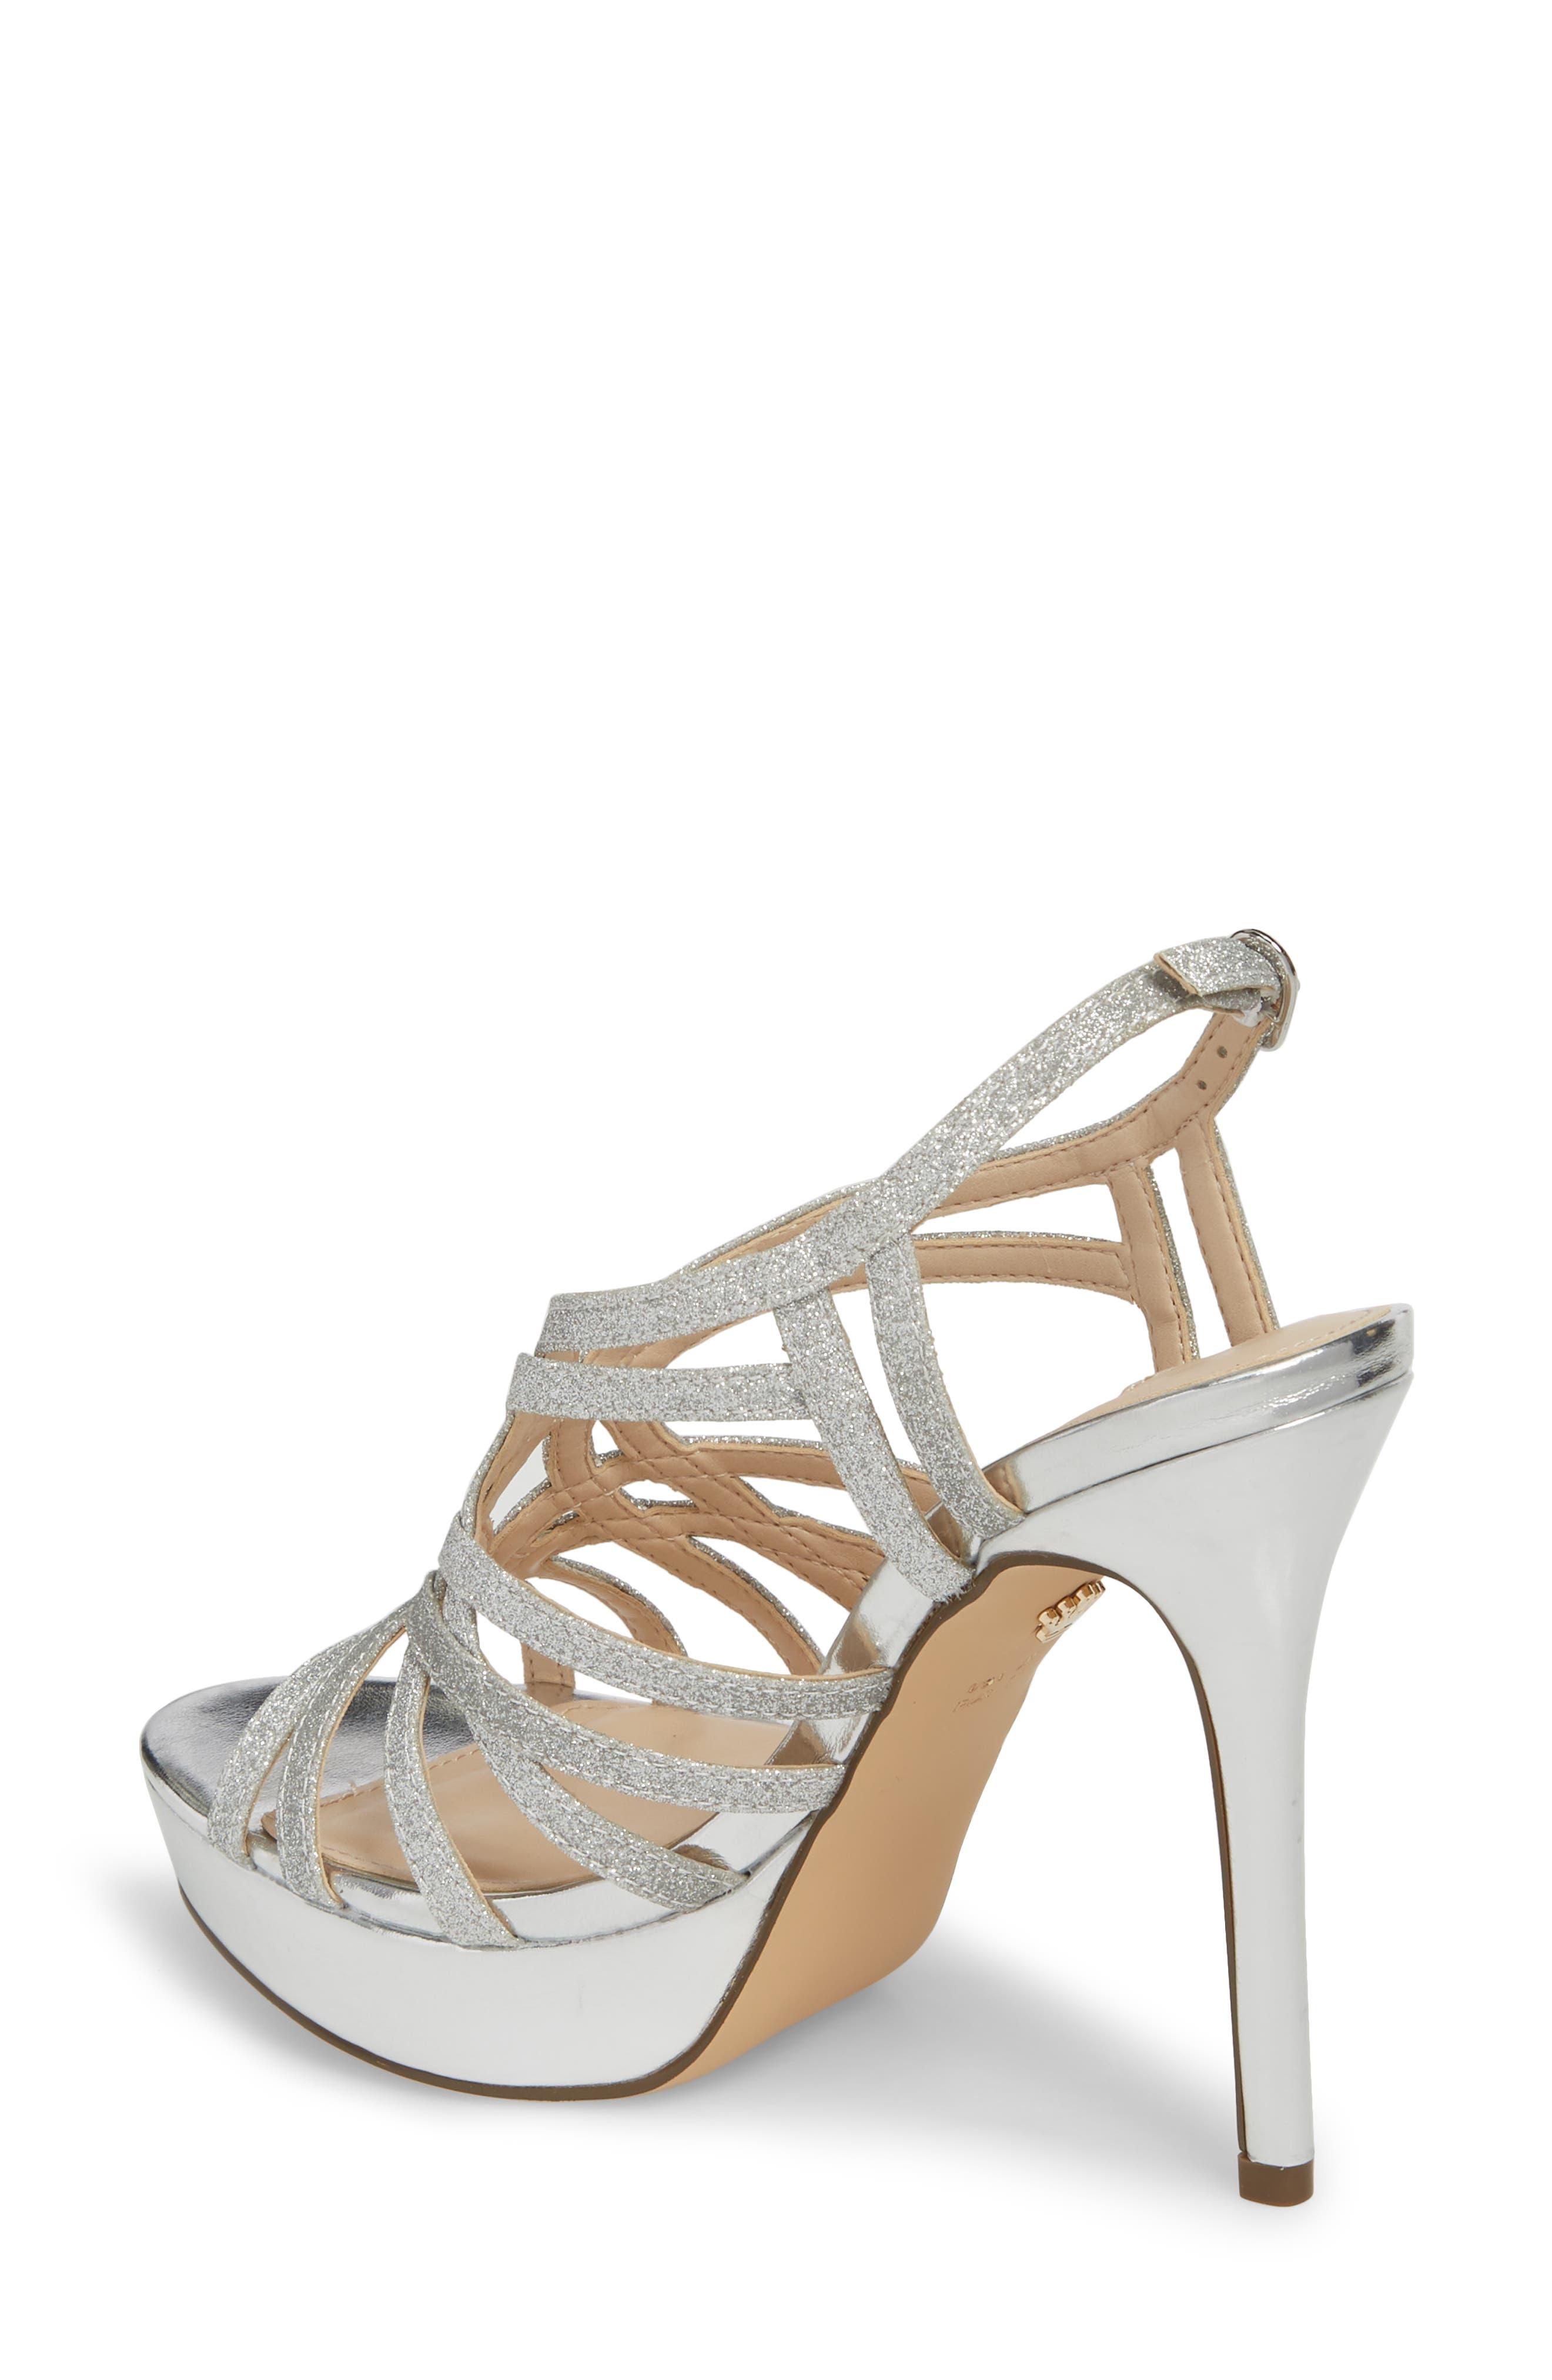 Solina Platform Sandal,                             Alternate thumbnail 4, color,